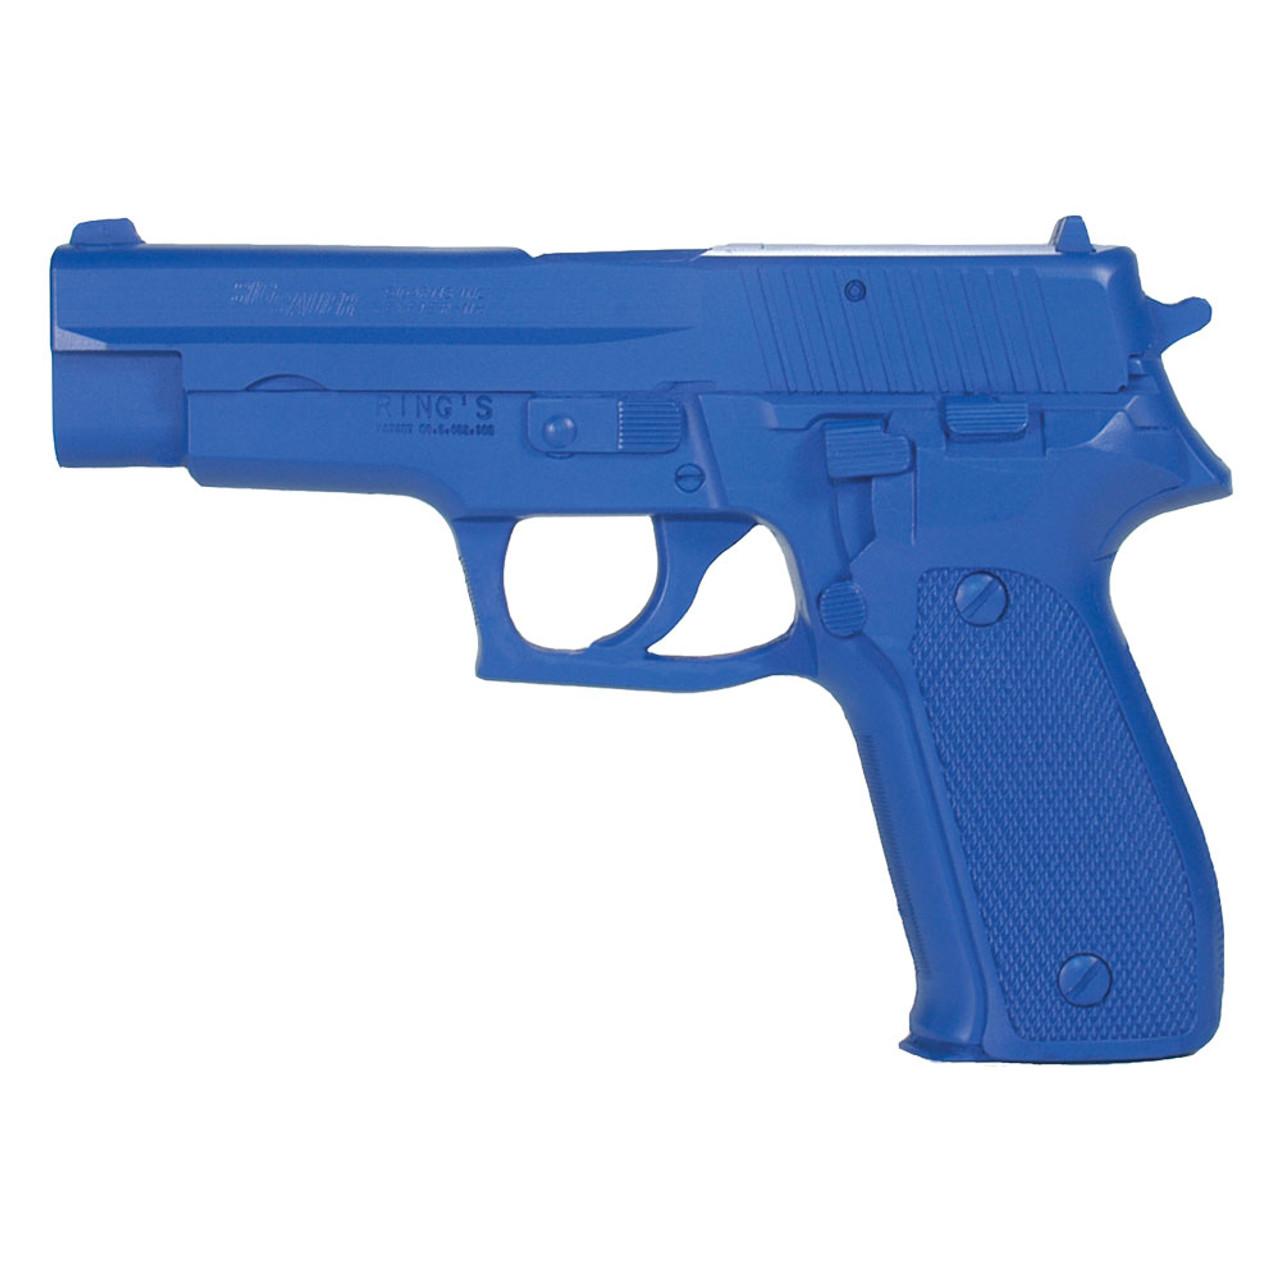 Blueguns - Sig P226